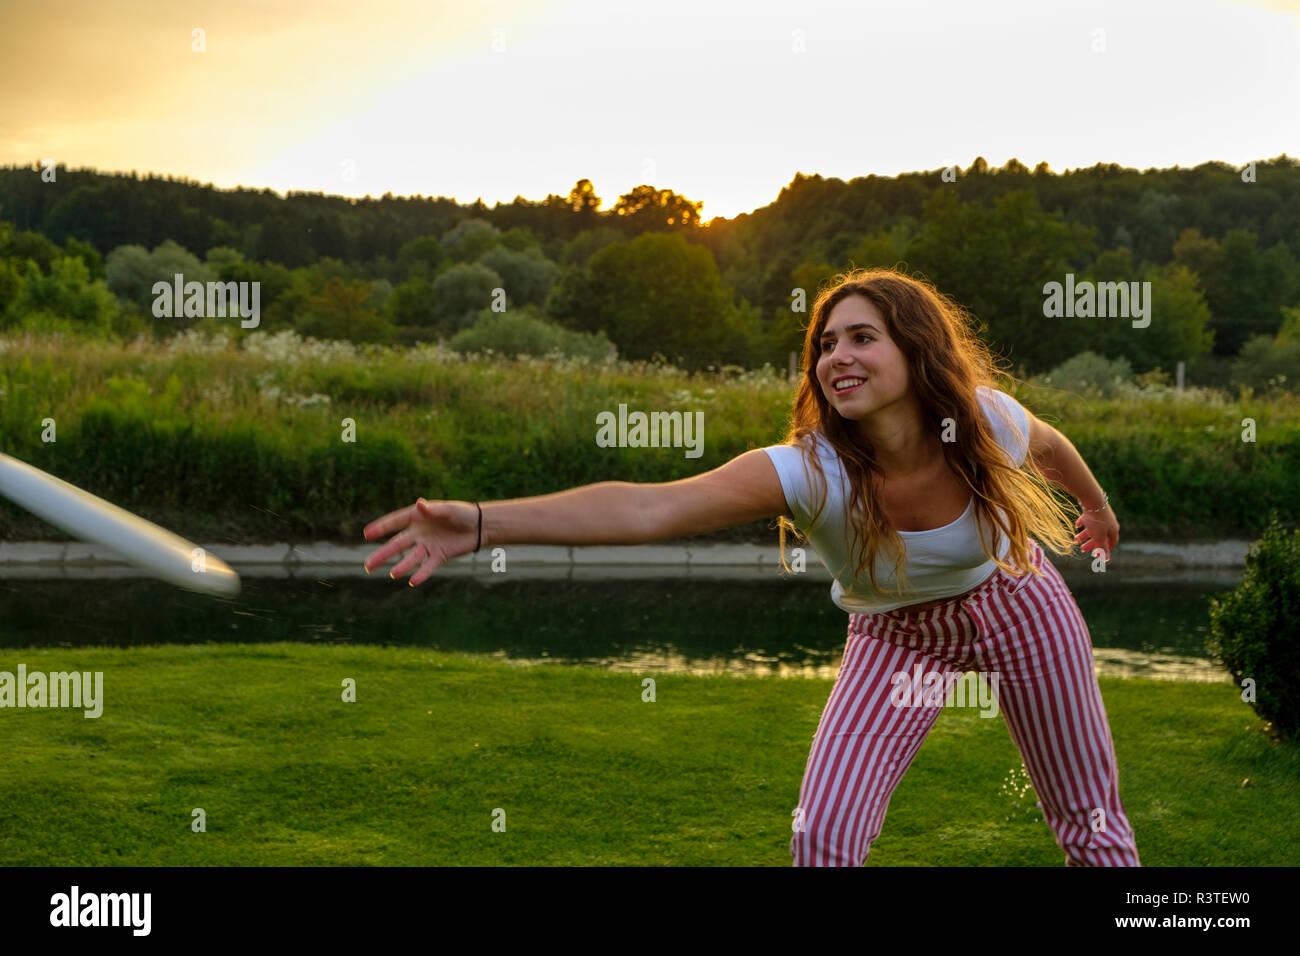 Mujer joven arrojando flying disc Foto de stock